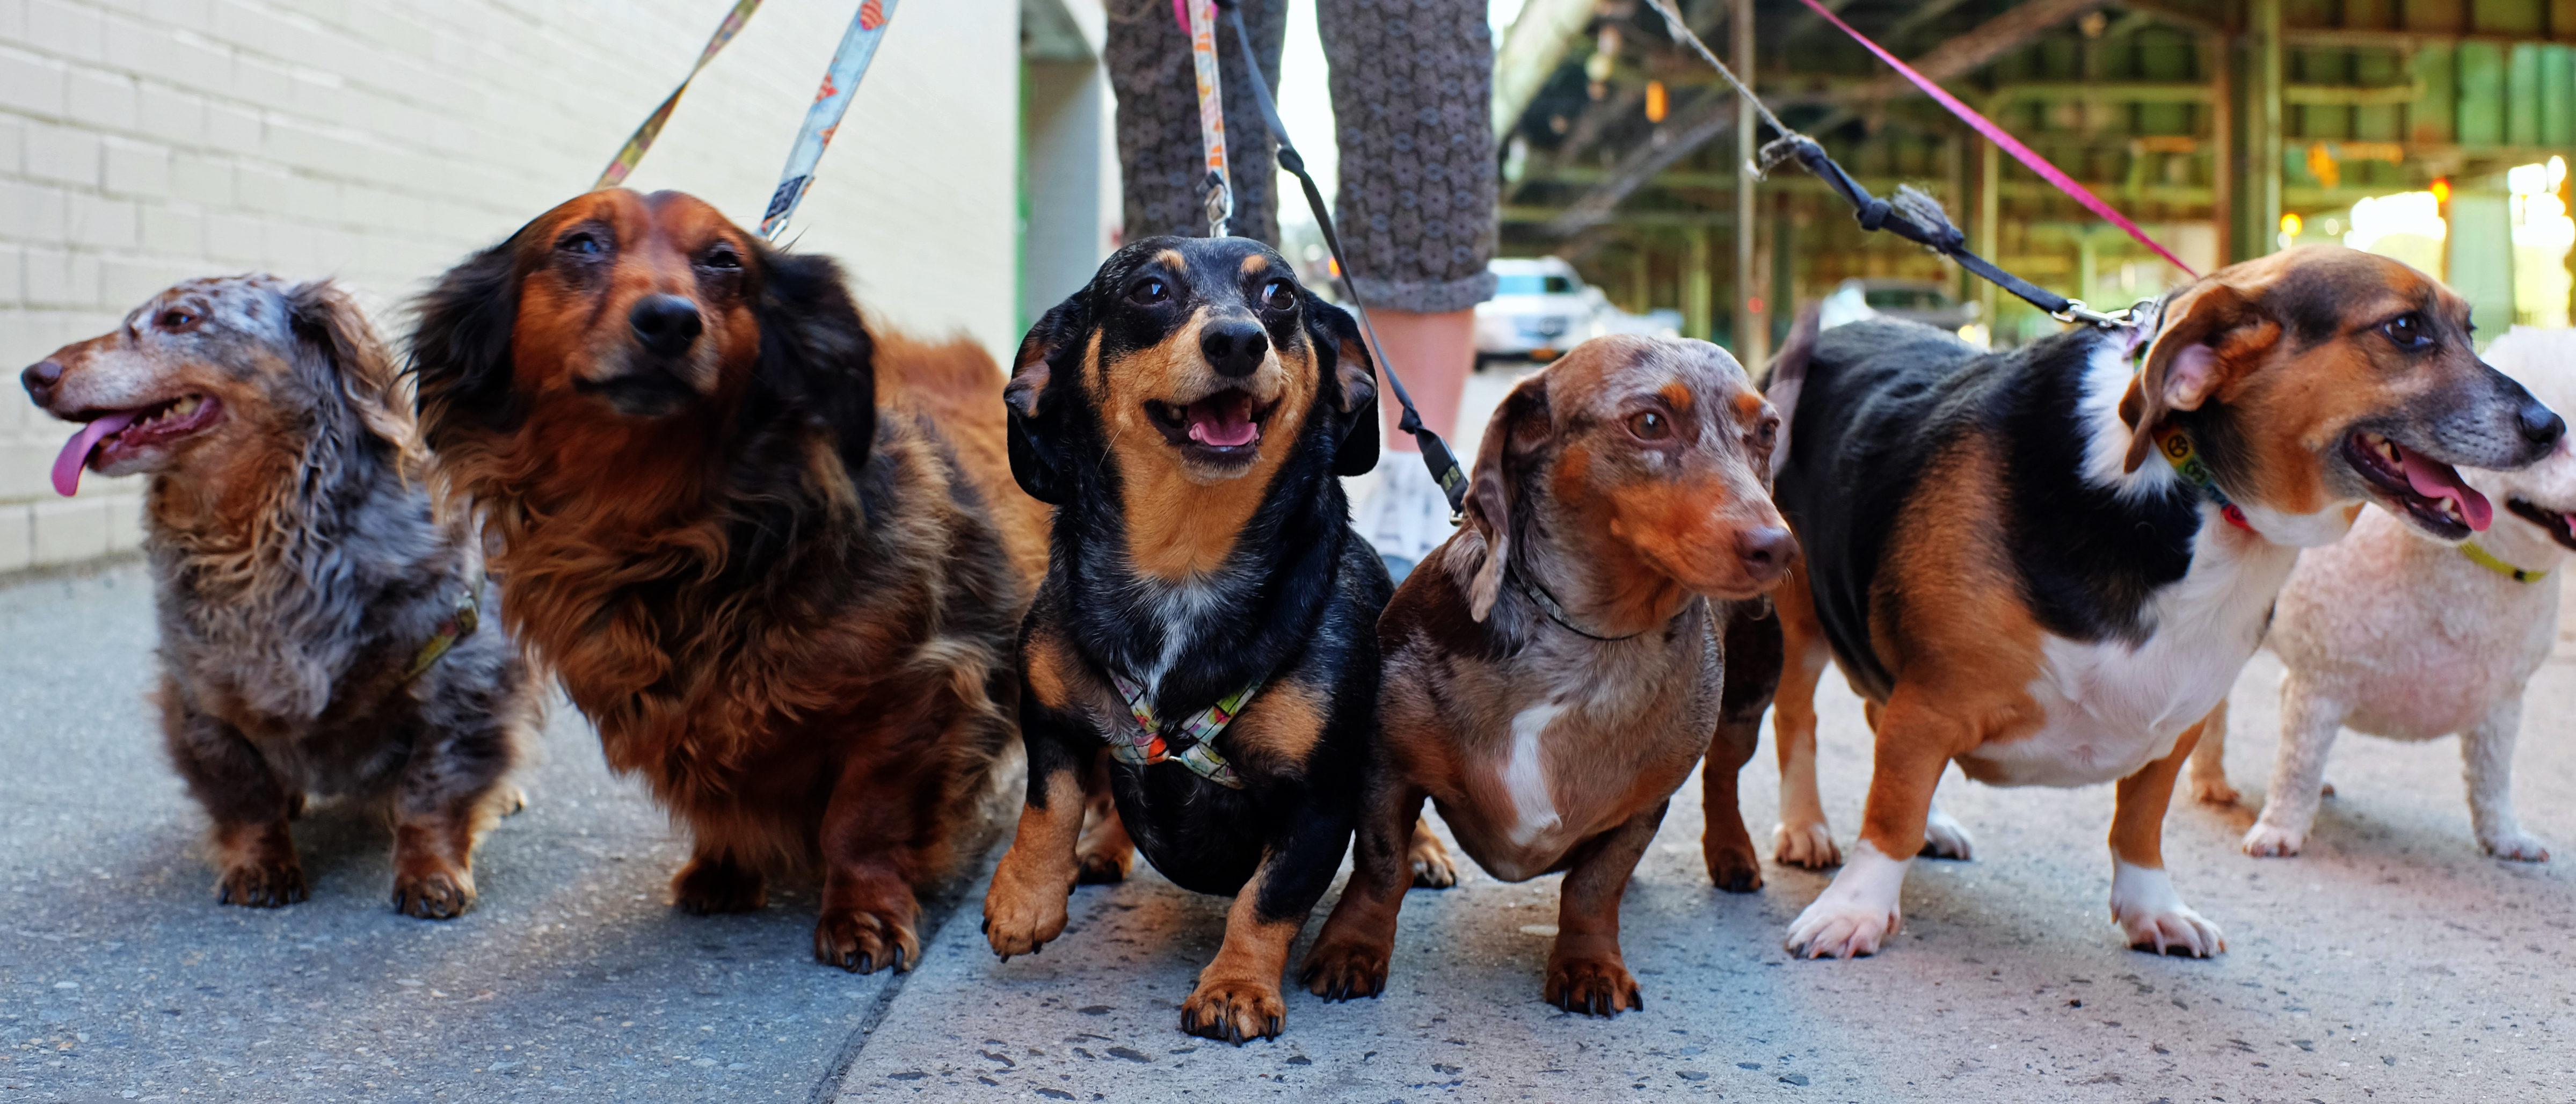 Dogs walking (Shutterstock/A Katz)